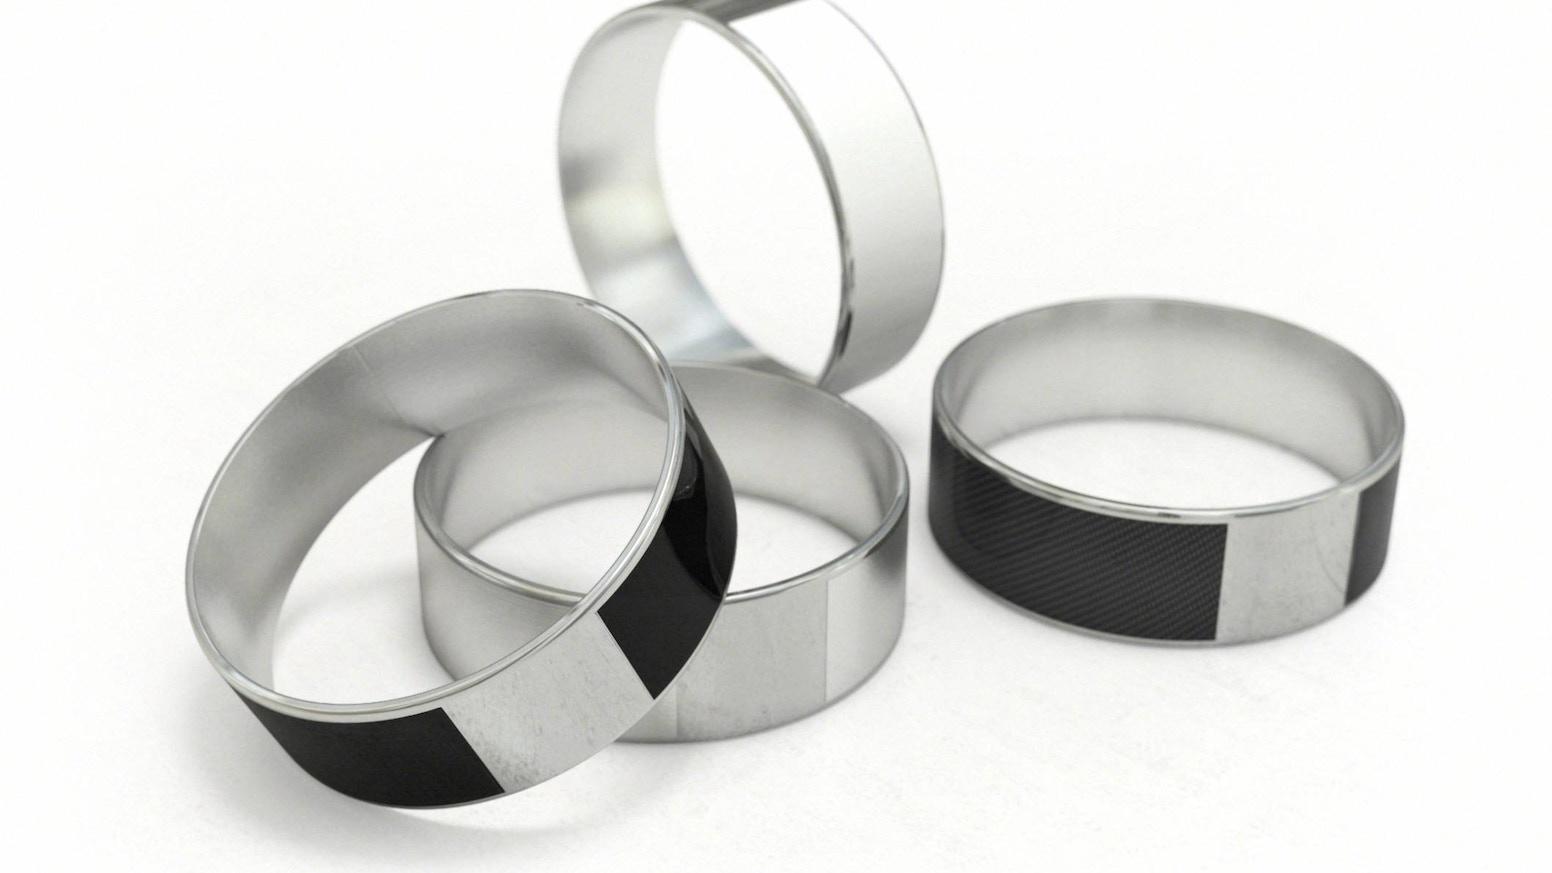 Nfc Ring By John Mclear Kickstarter